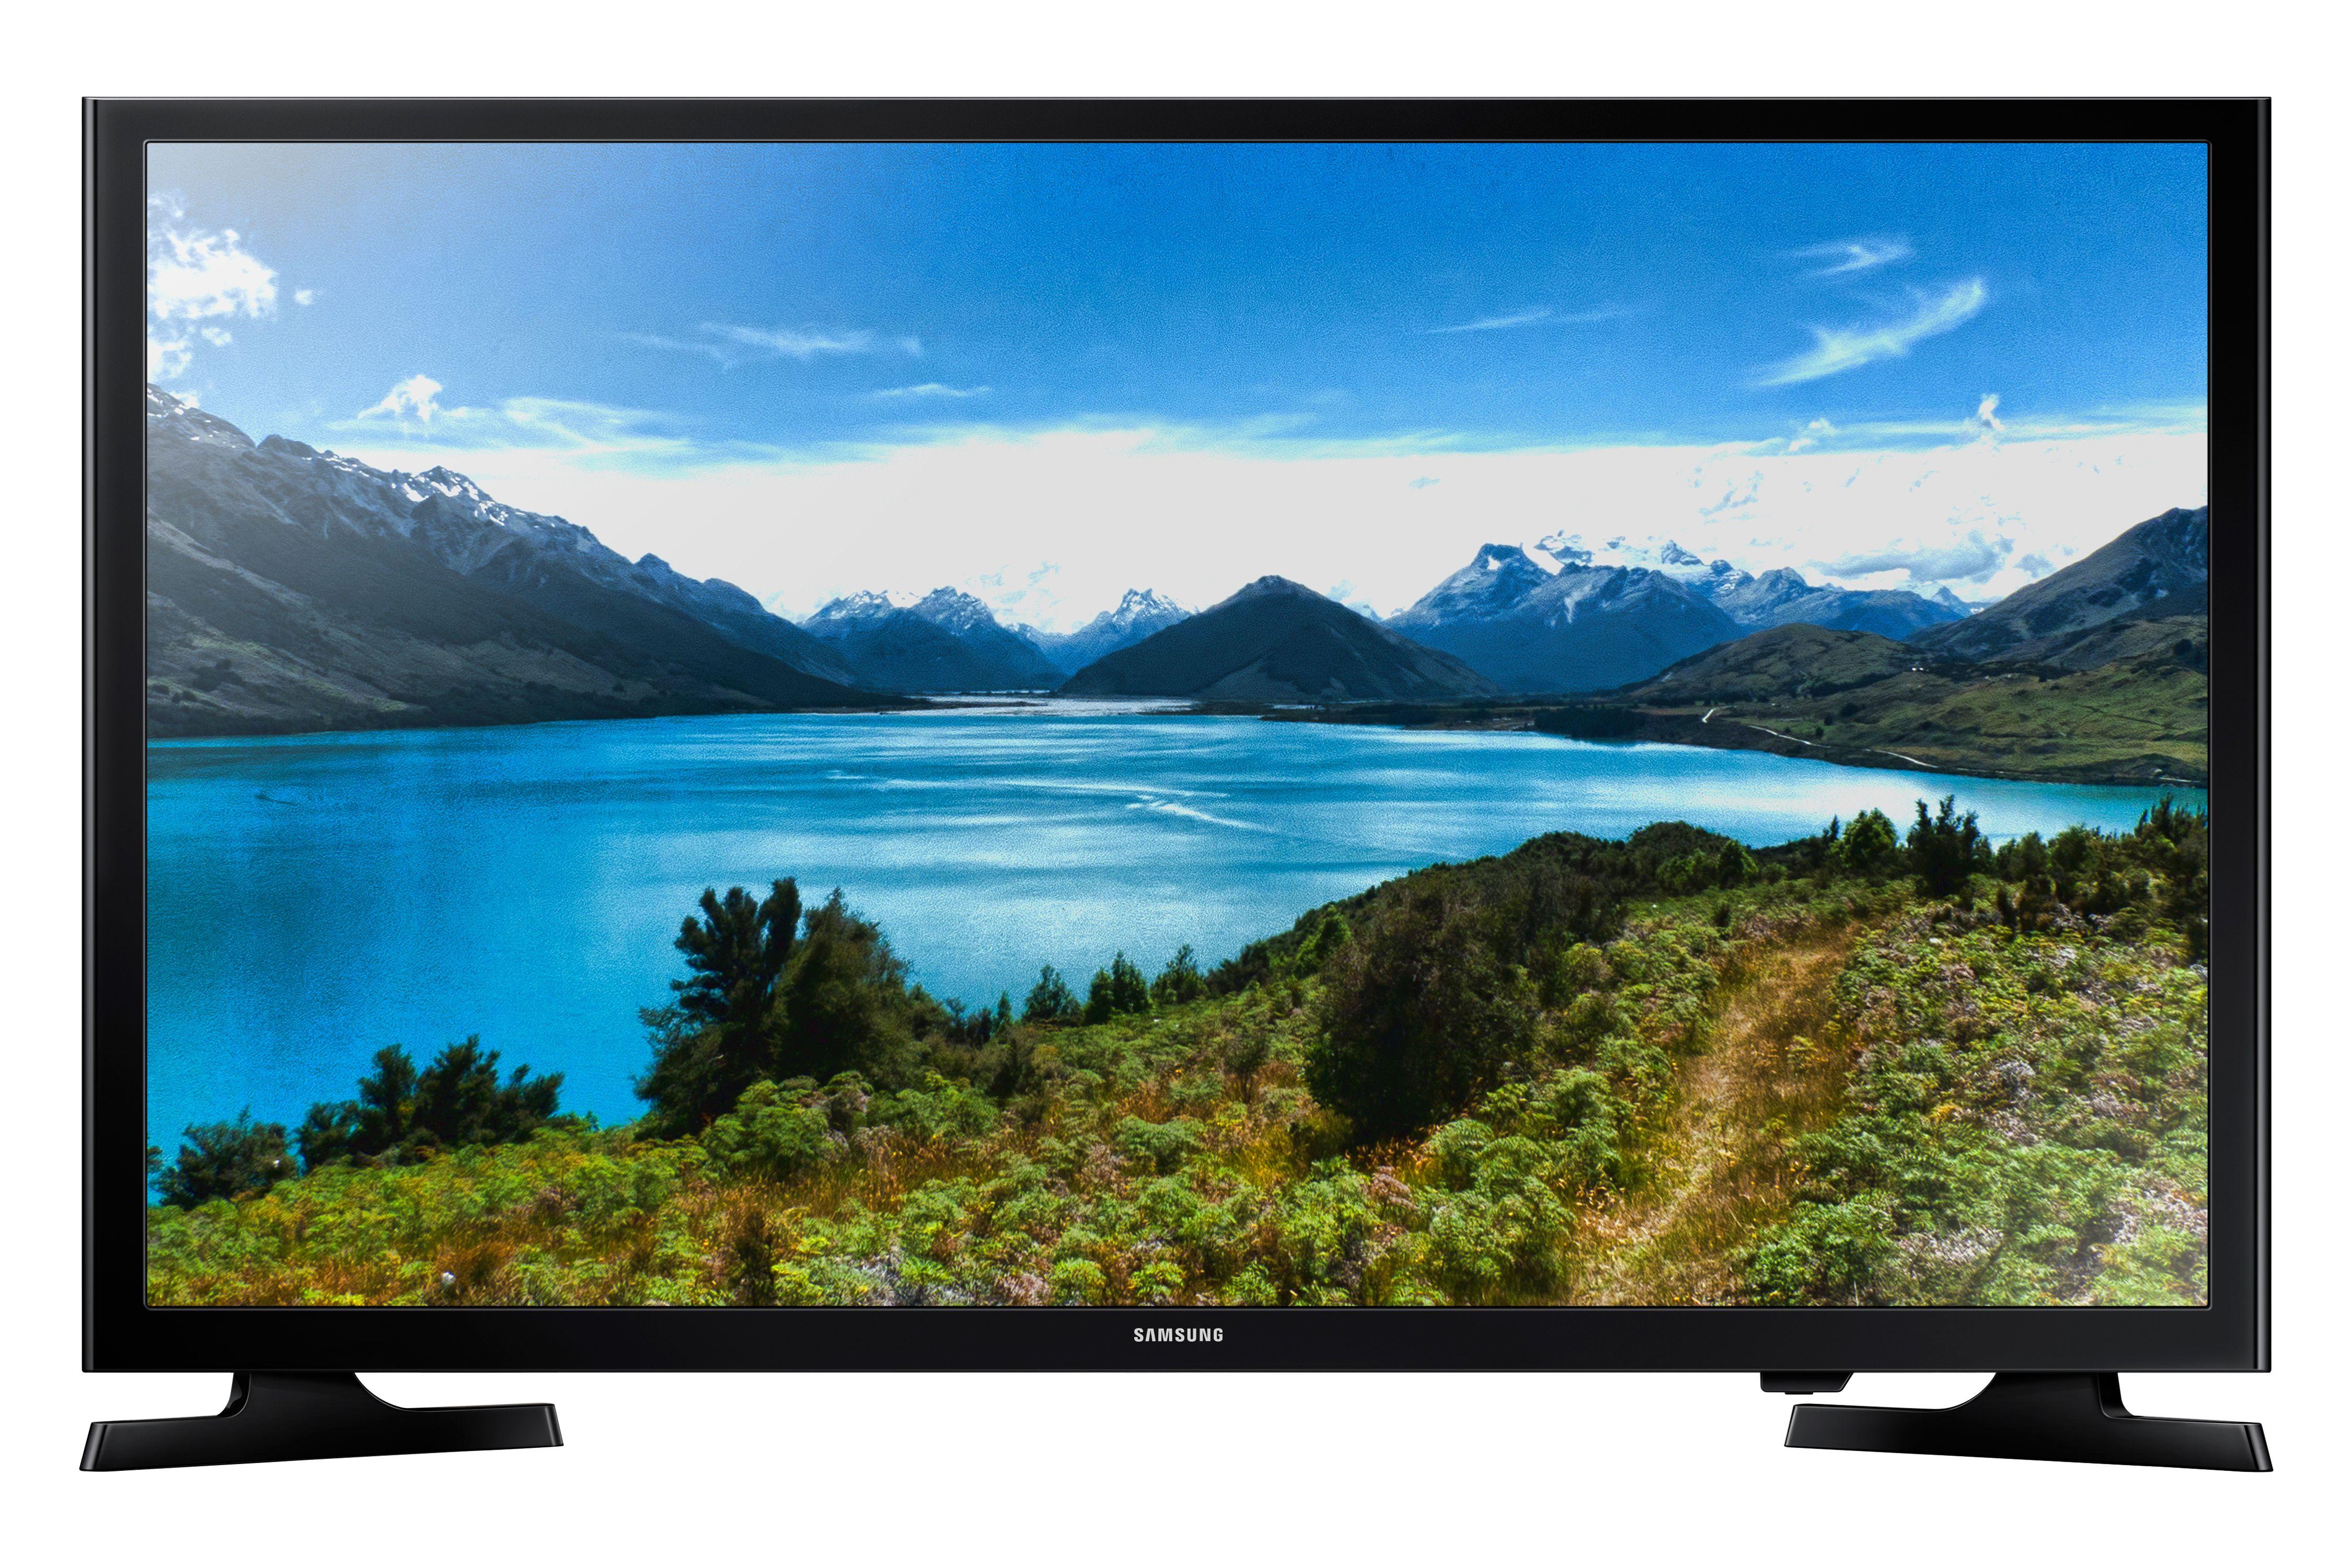 Samsung Un32j4000 32 Class 720p 60hz Slim Led Hdtv Telewizor Led Telewizor Samsung